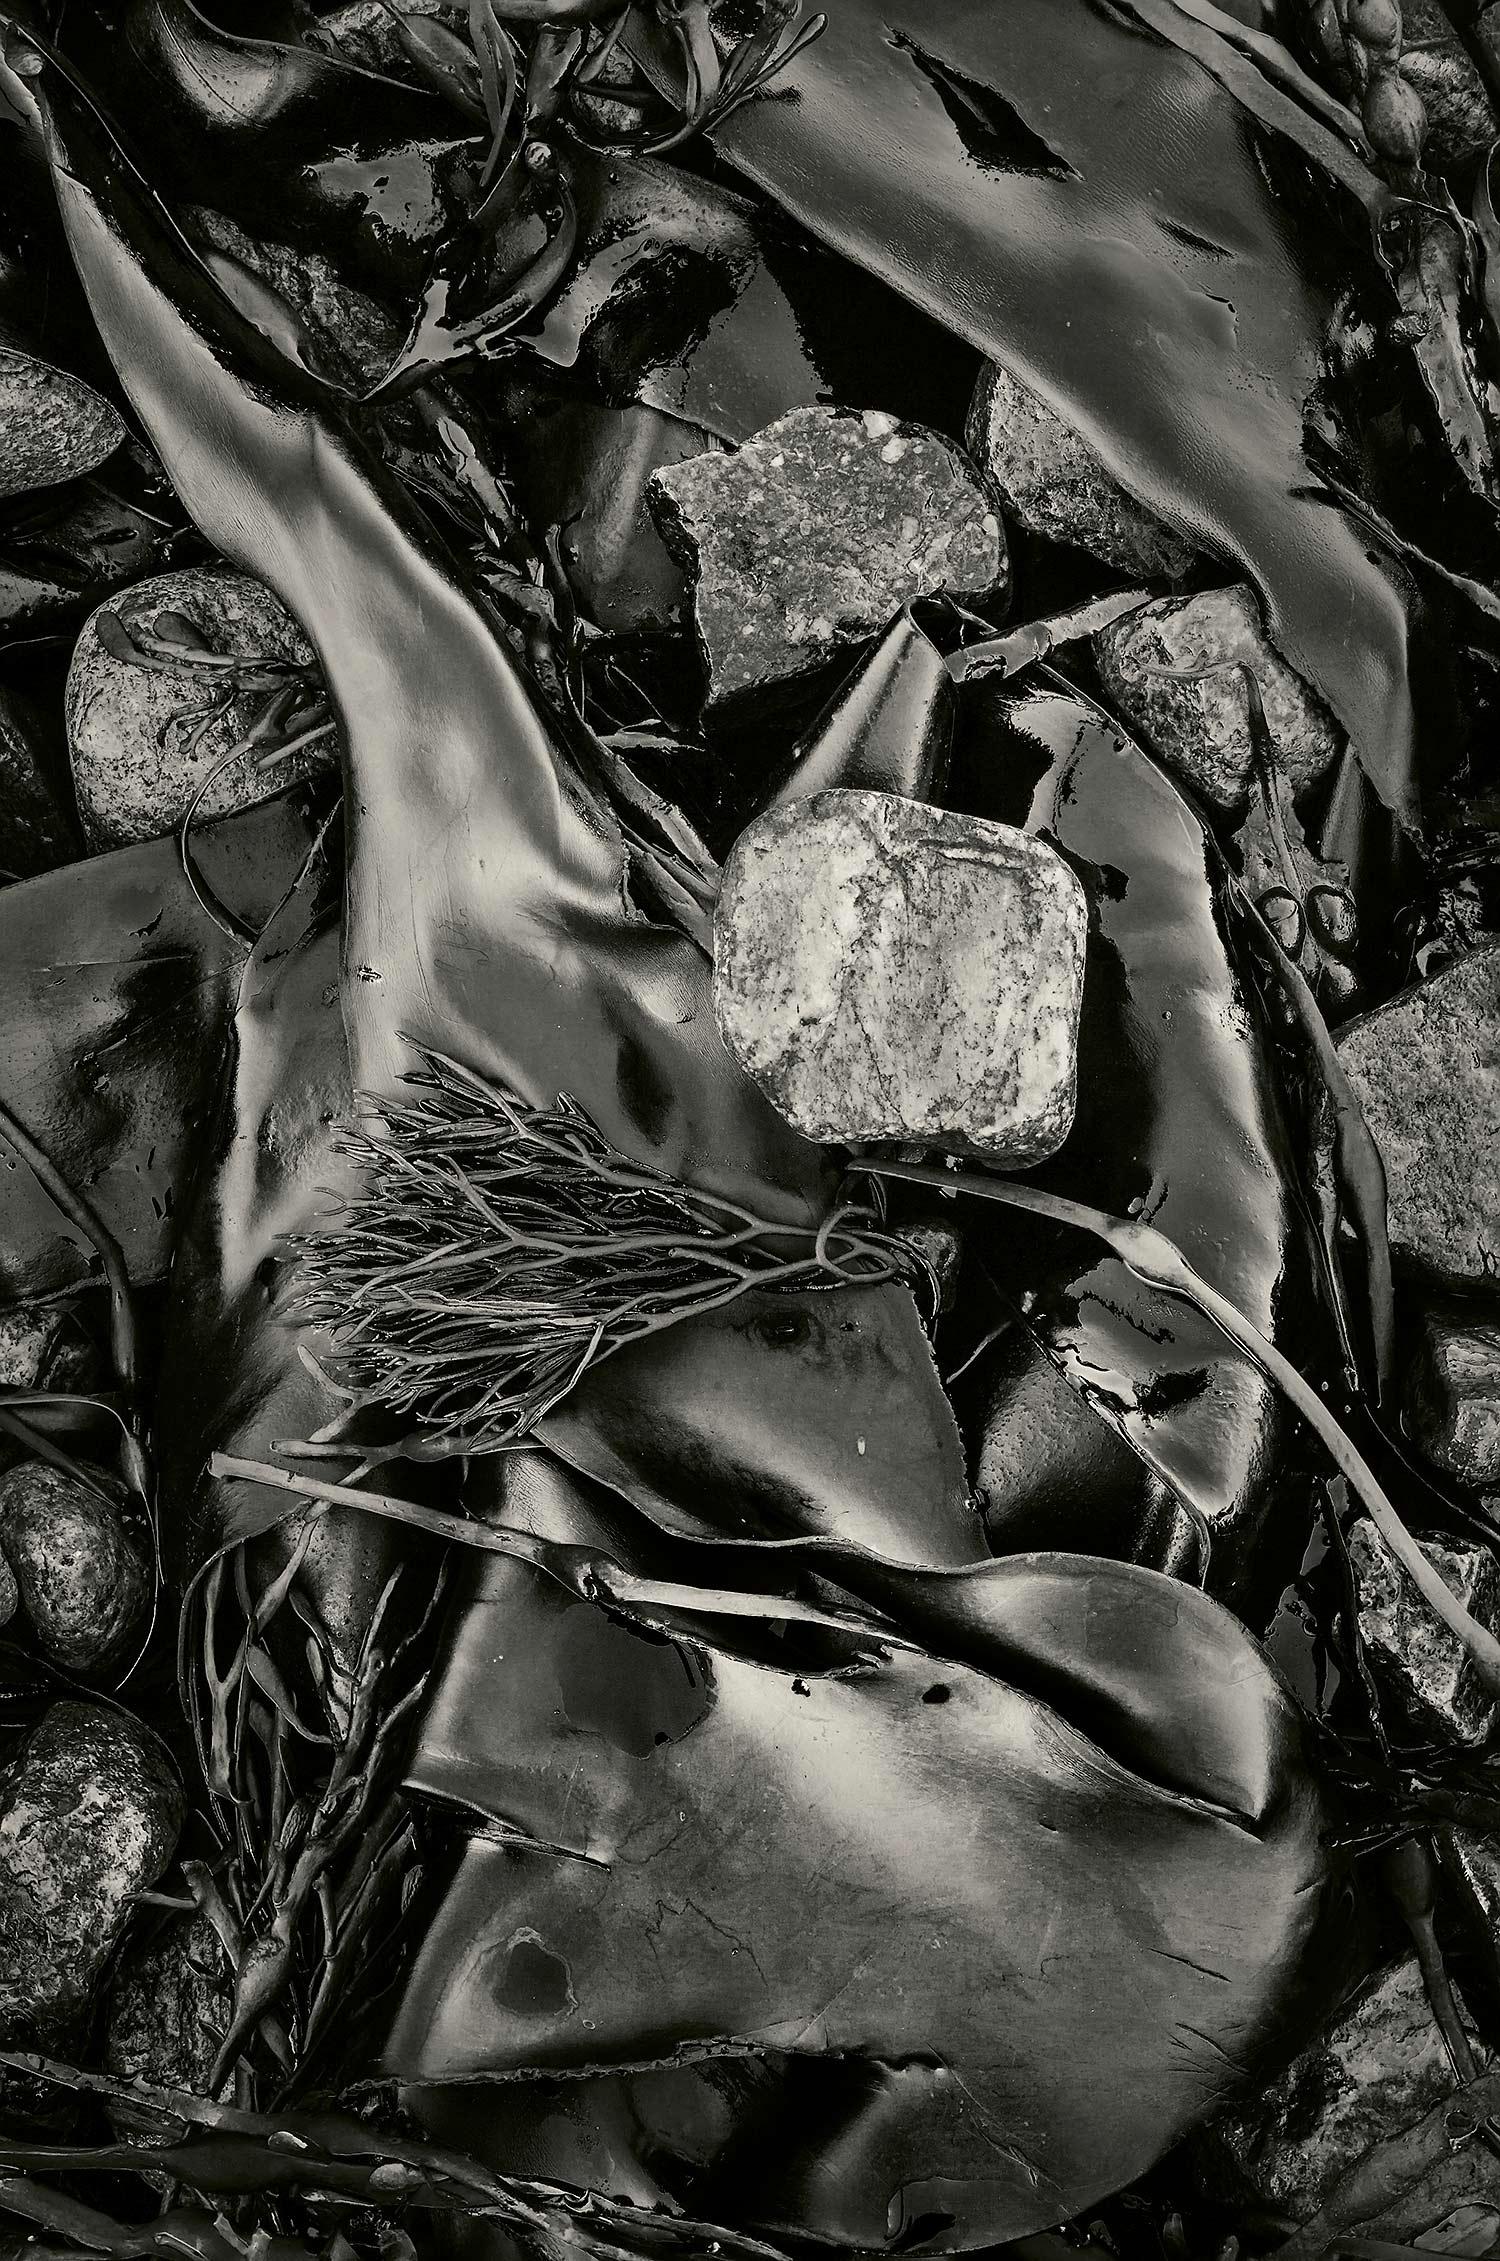 Seaweed 595, Seawall, Maine, 2012